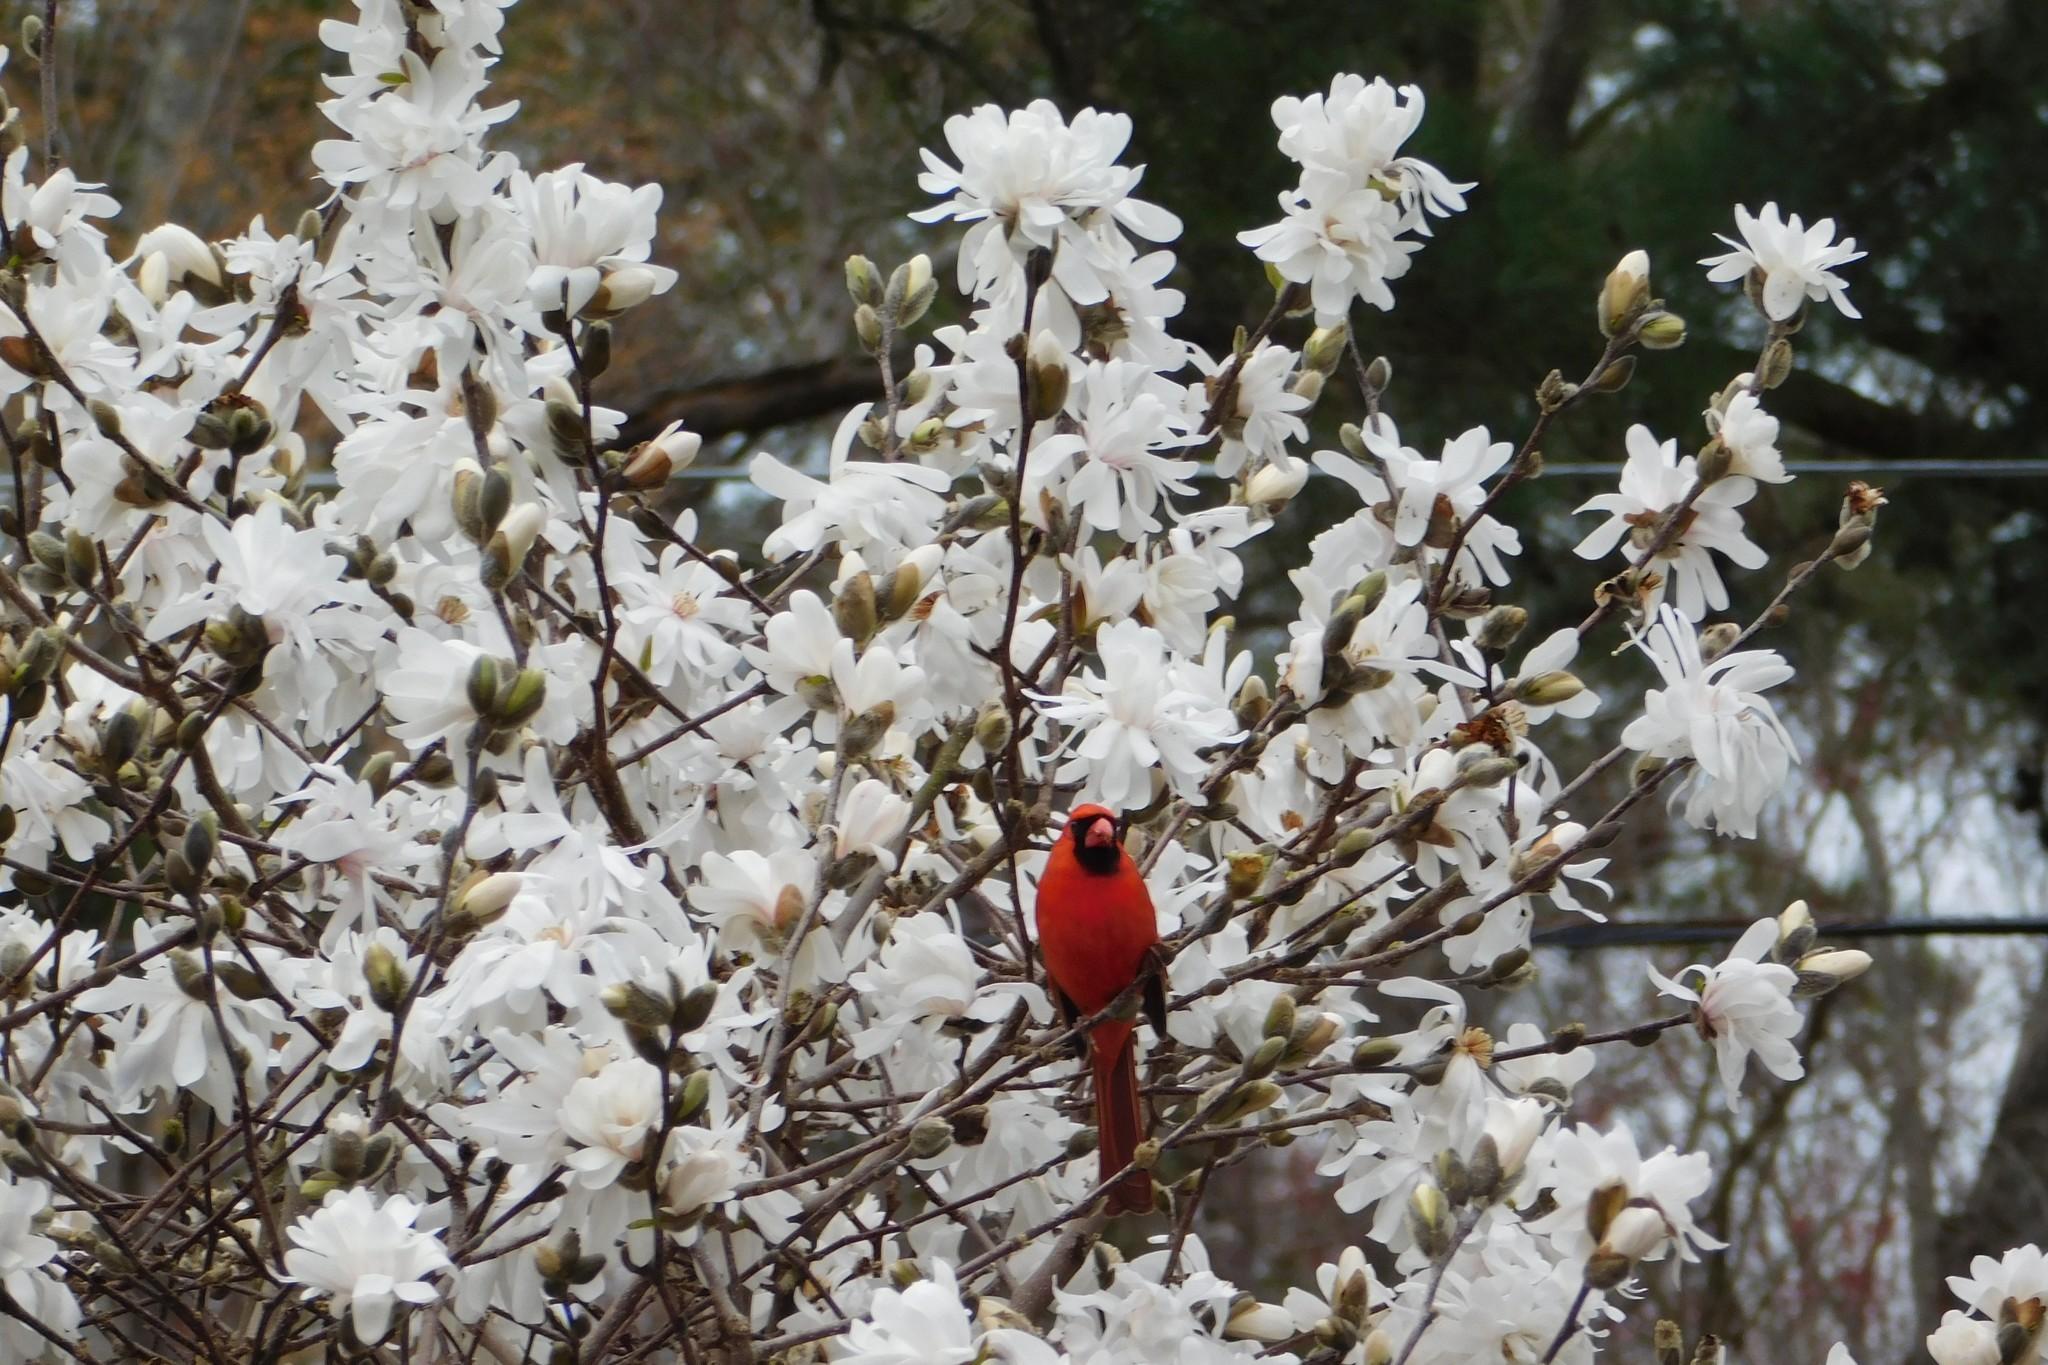 Cardinal In Star Magnolia Tree The Virginia Gazette